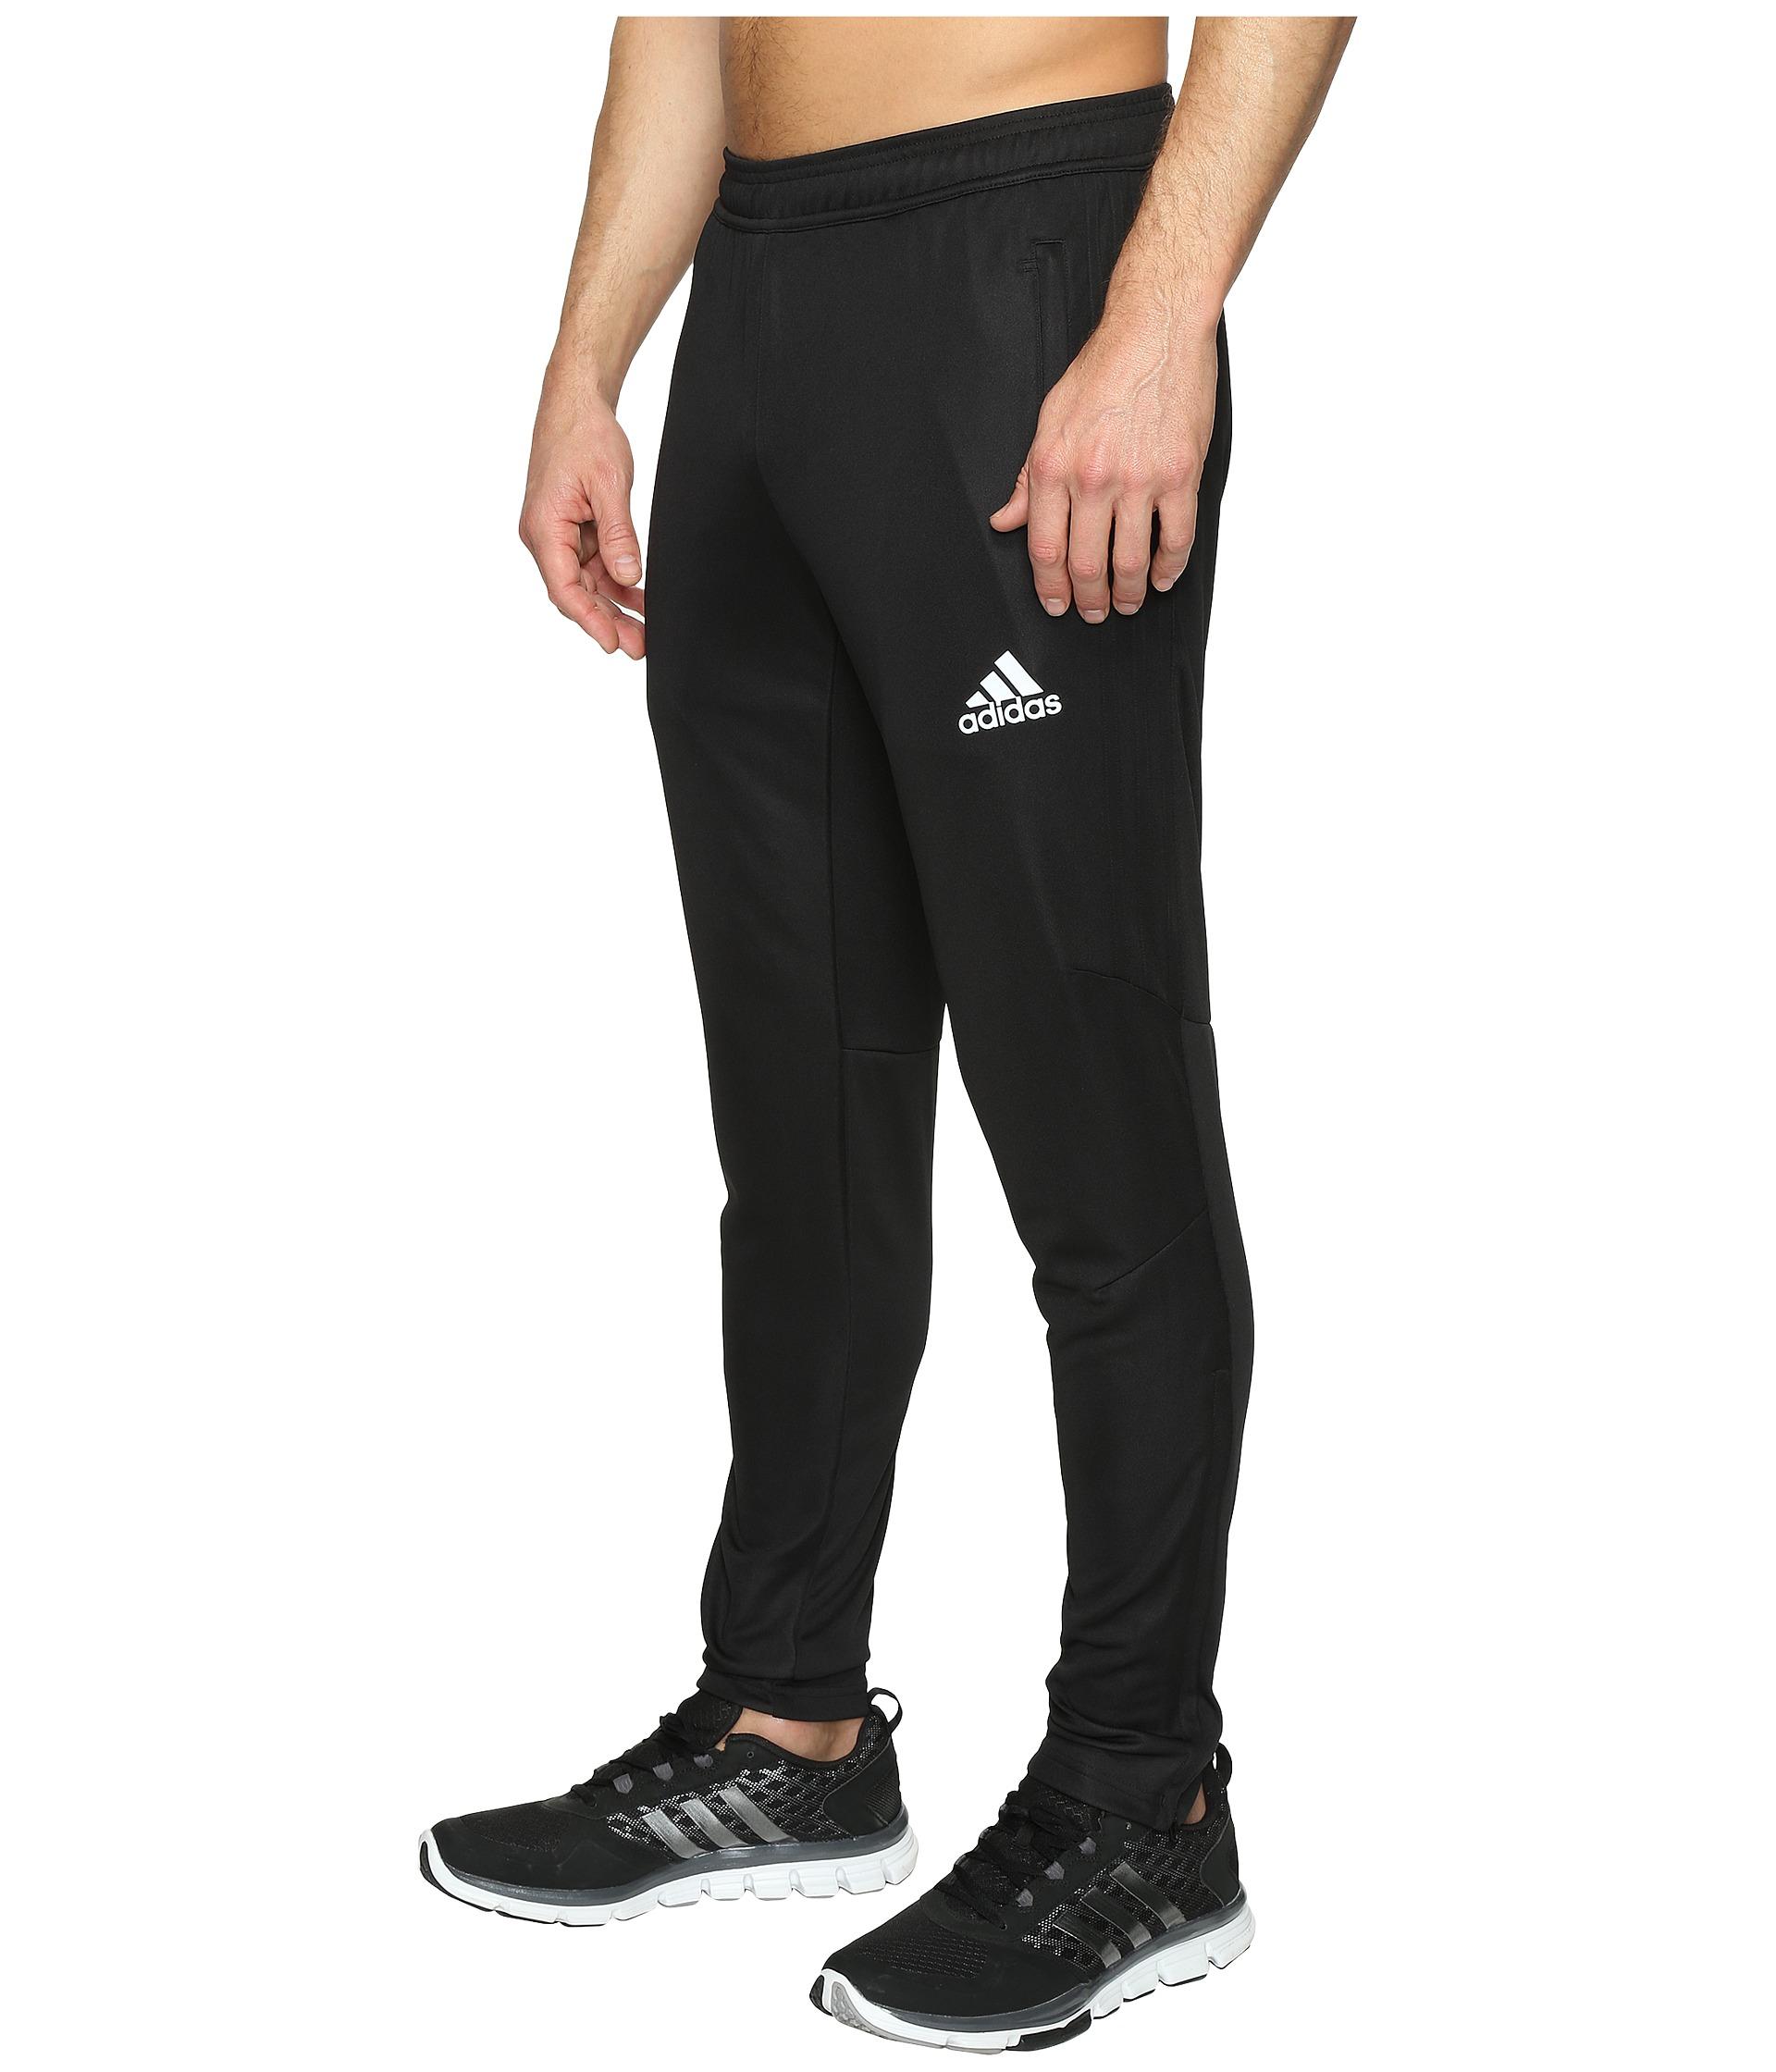 Adidas Tiro u0026#39;17 Pants at Zappos.com